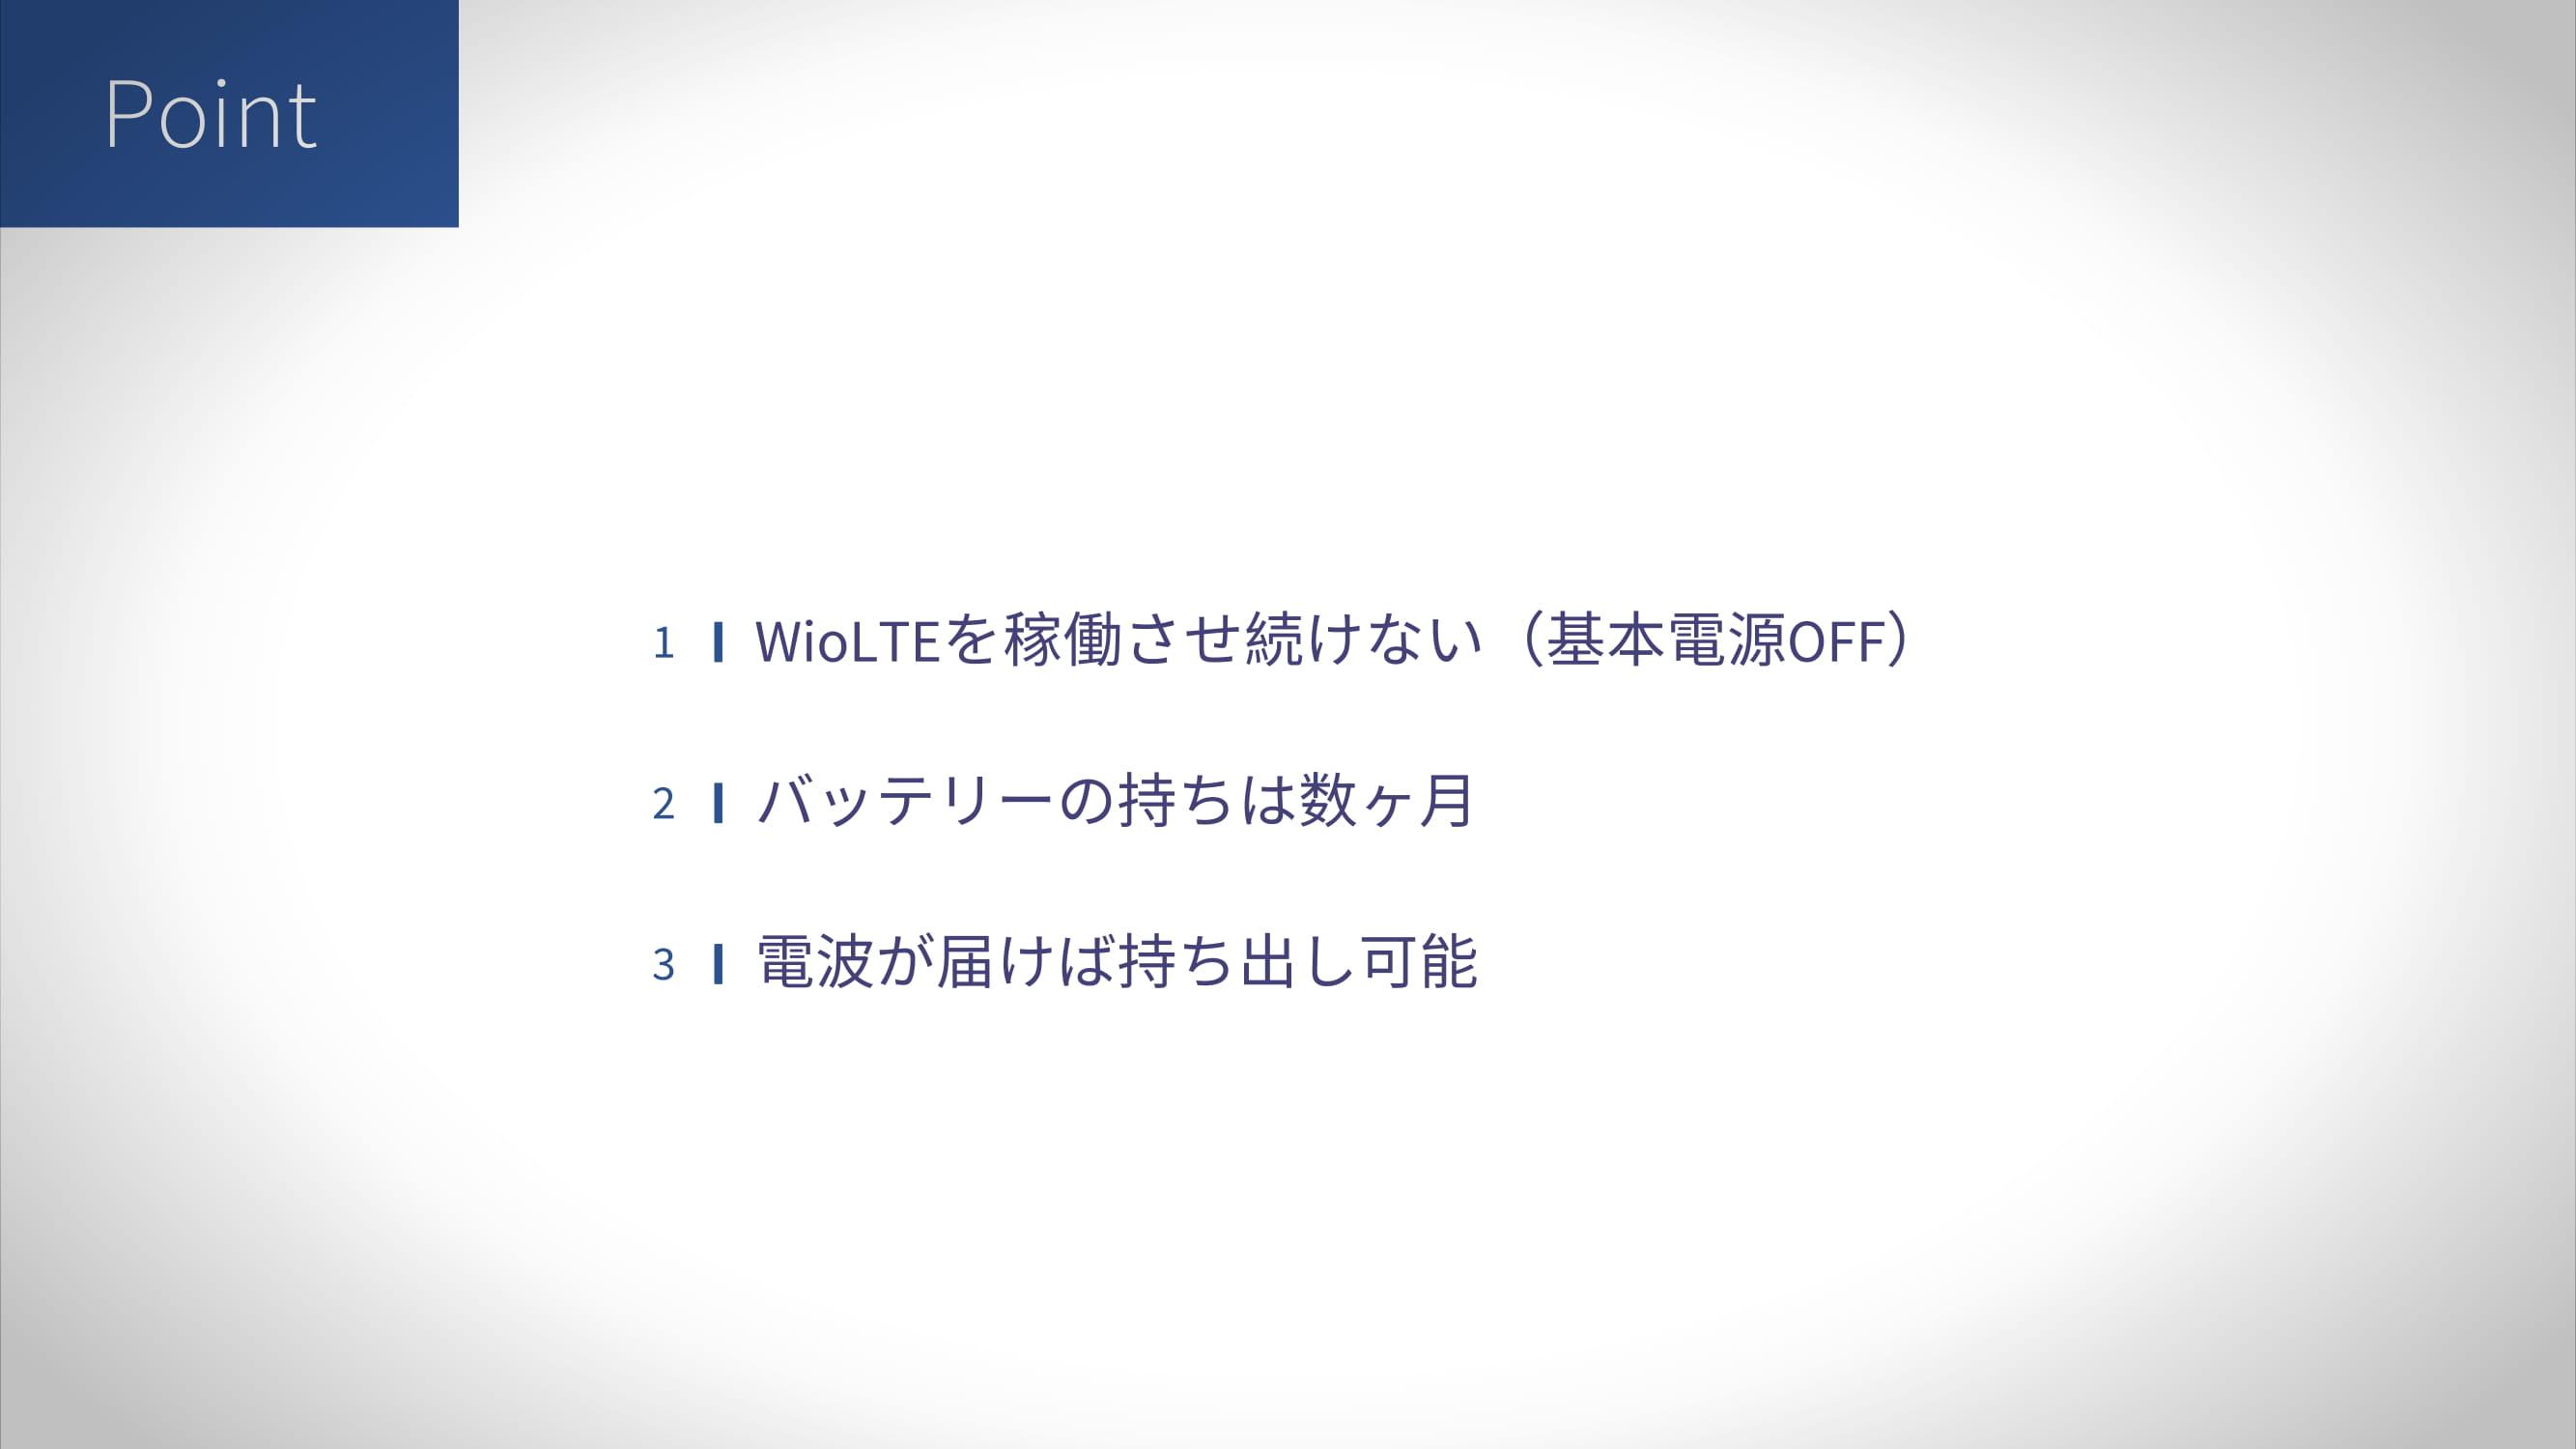 SORACOMUGTokyo10-08.jpg